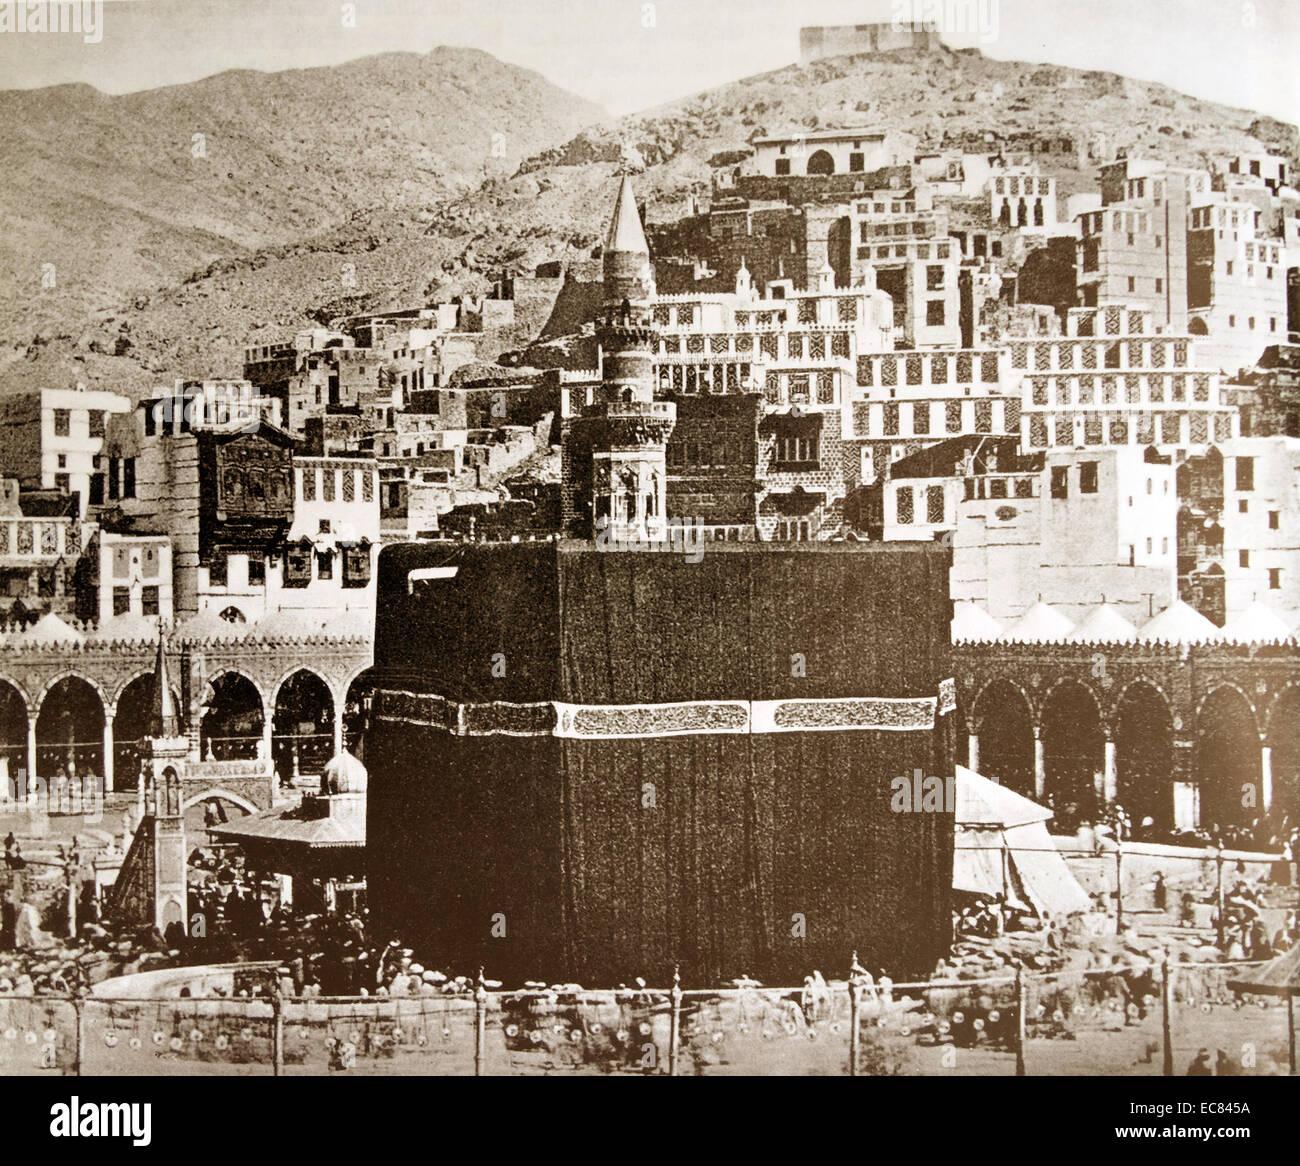 Kaaba Mecca Saudi Arabia Stock Photos & Kaaba Mecca Saudi